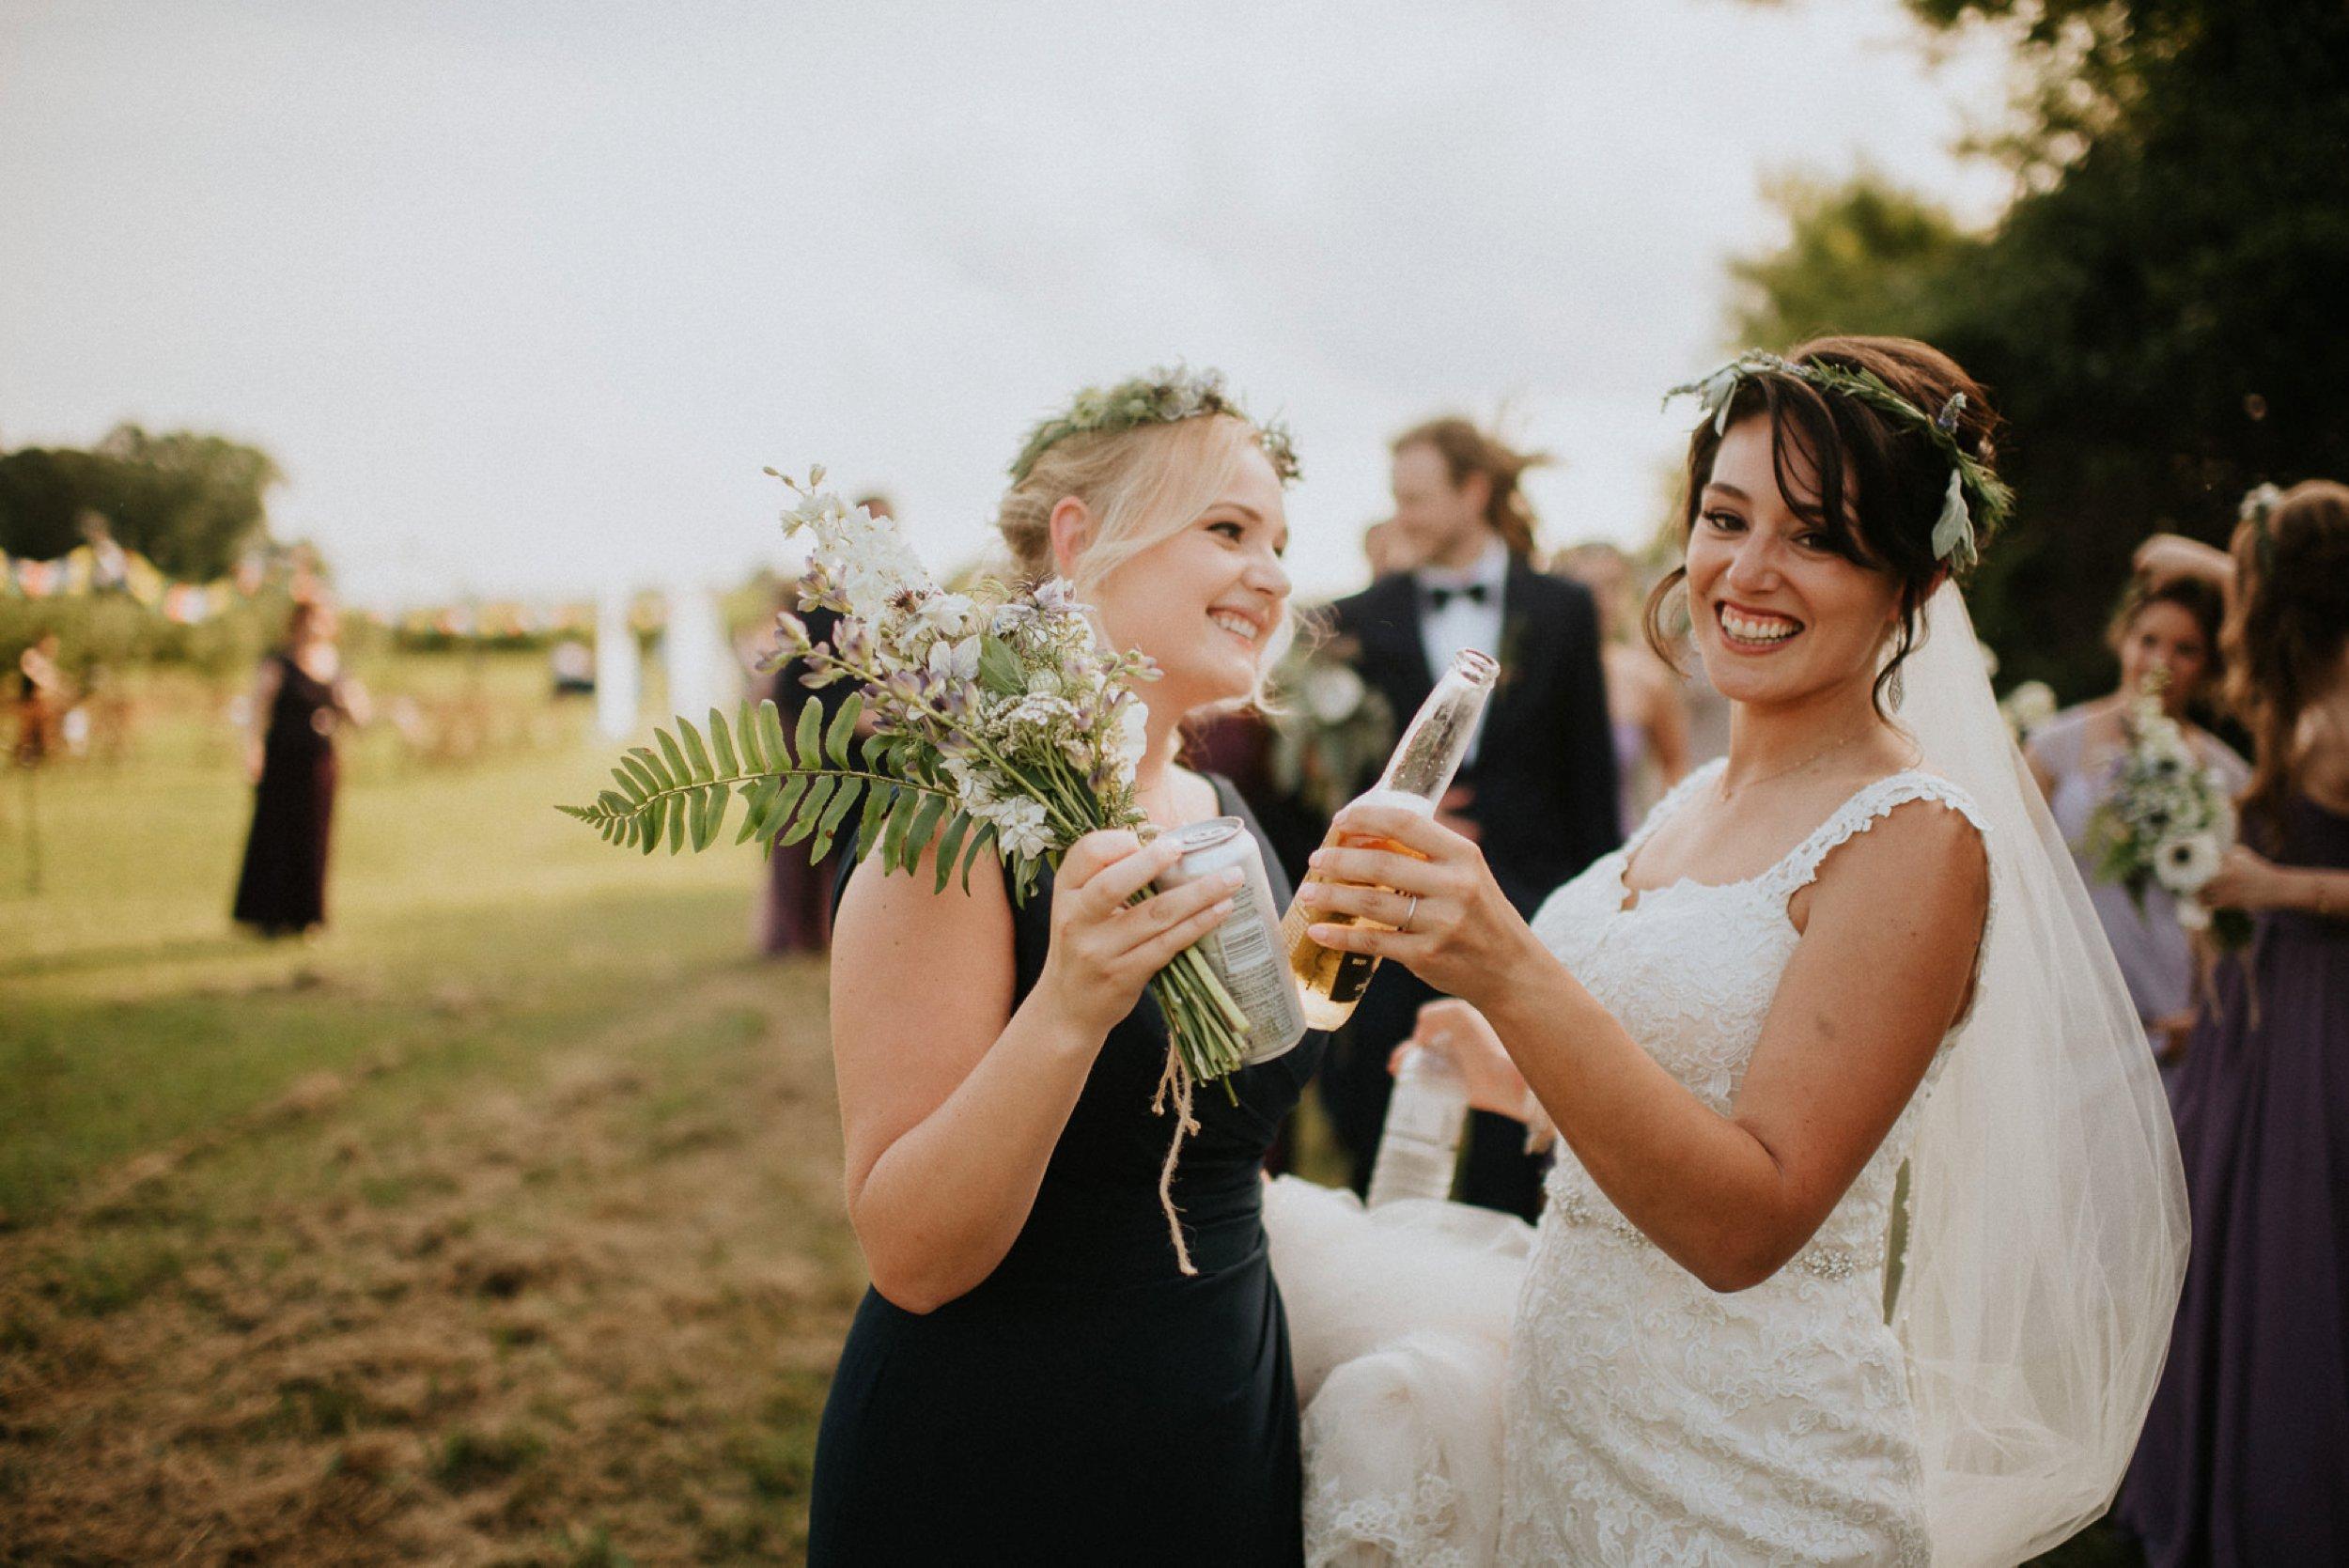 milburn_farms-wedding-48.jpg